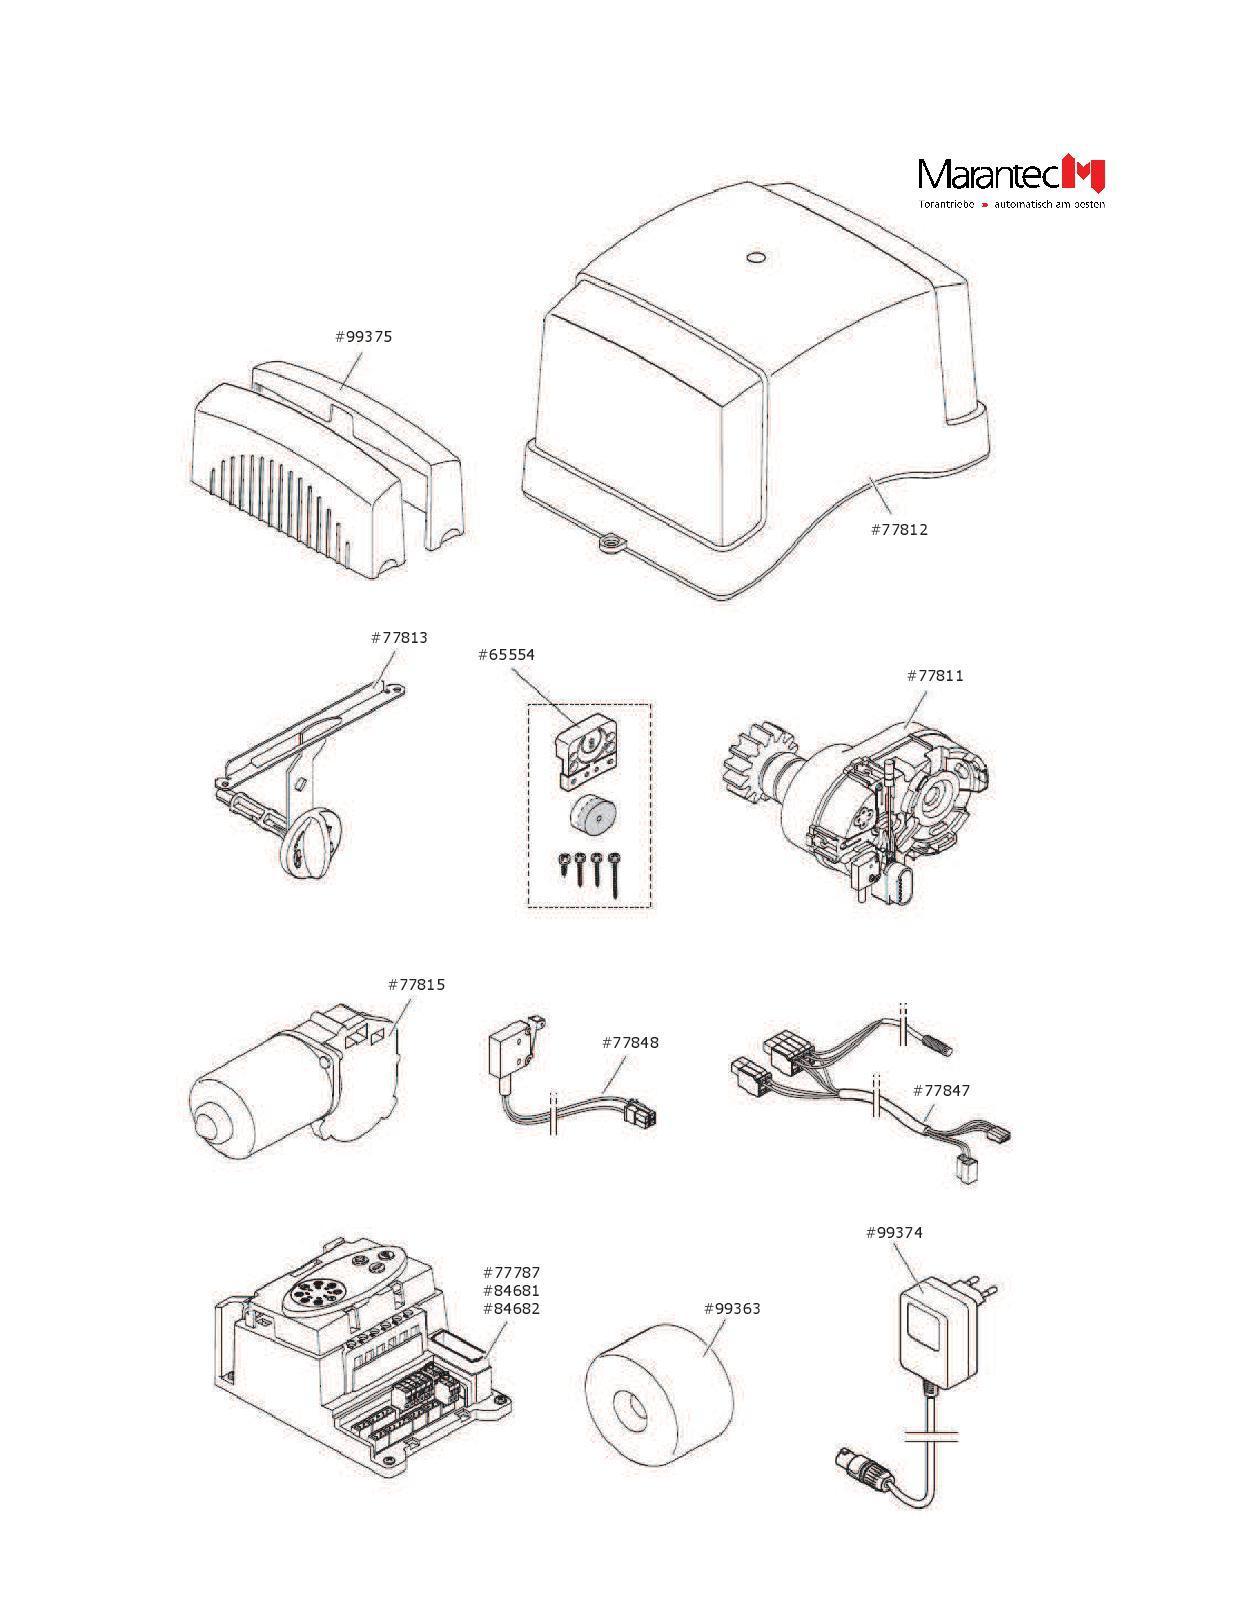 Ersatz Ersatzentriegelungseinheit F R Marantec Comfort 870